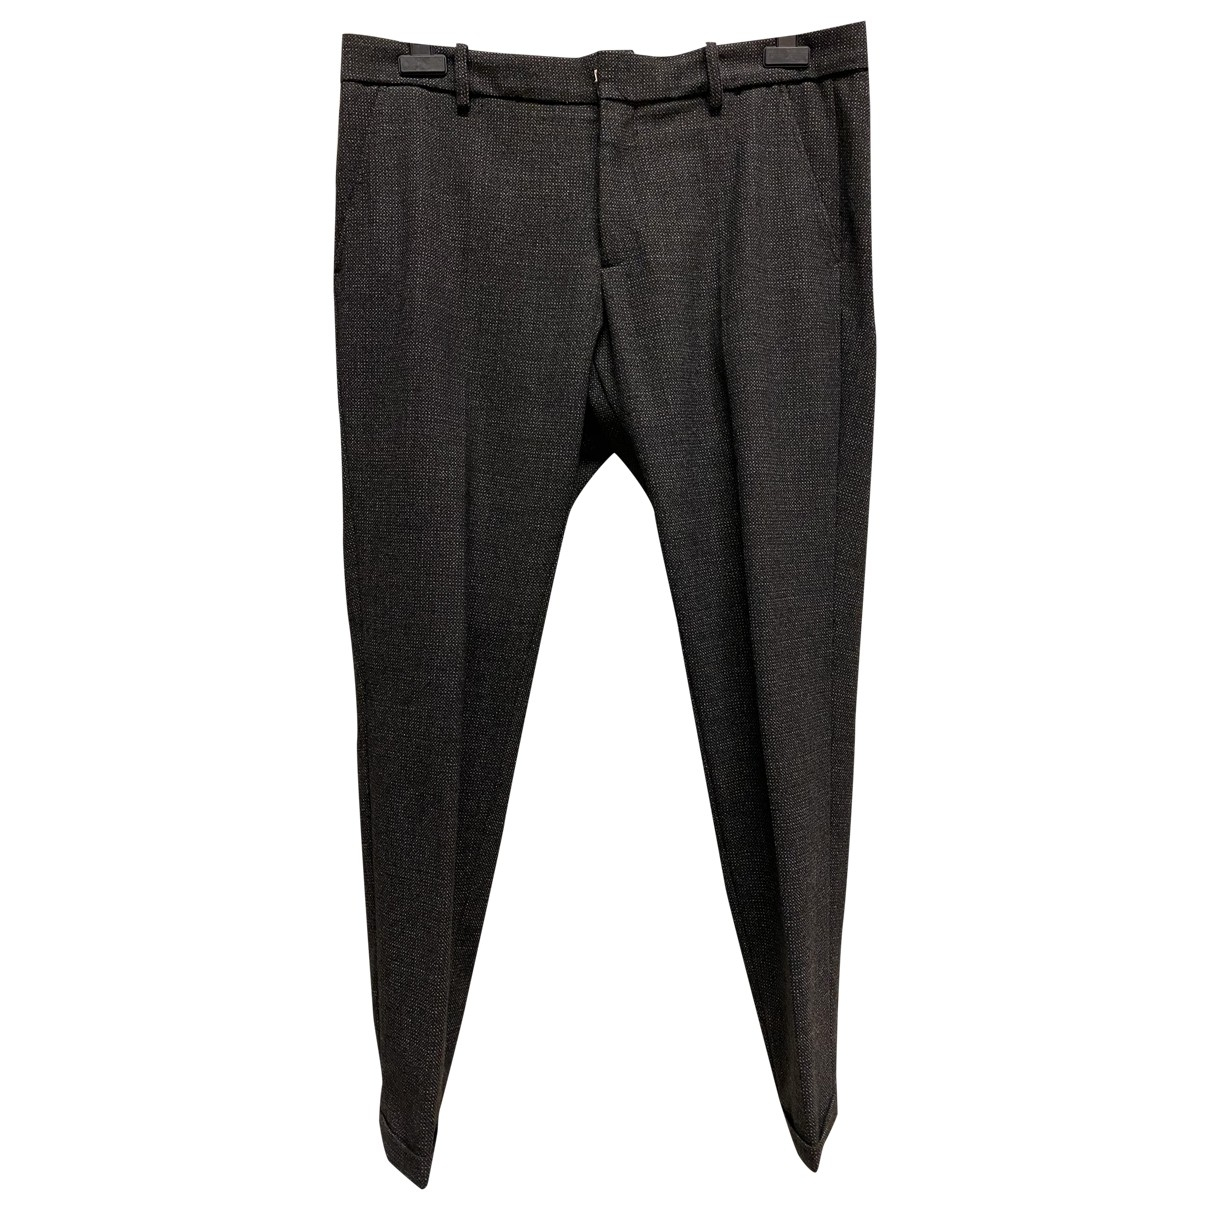 Antonio Marras \N Anthracite Trousers for Men 52 IT